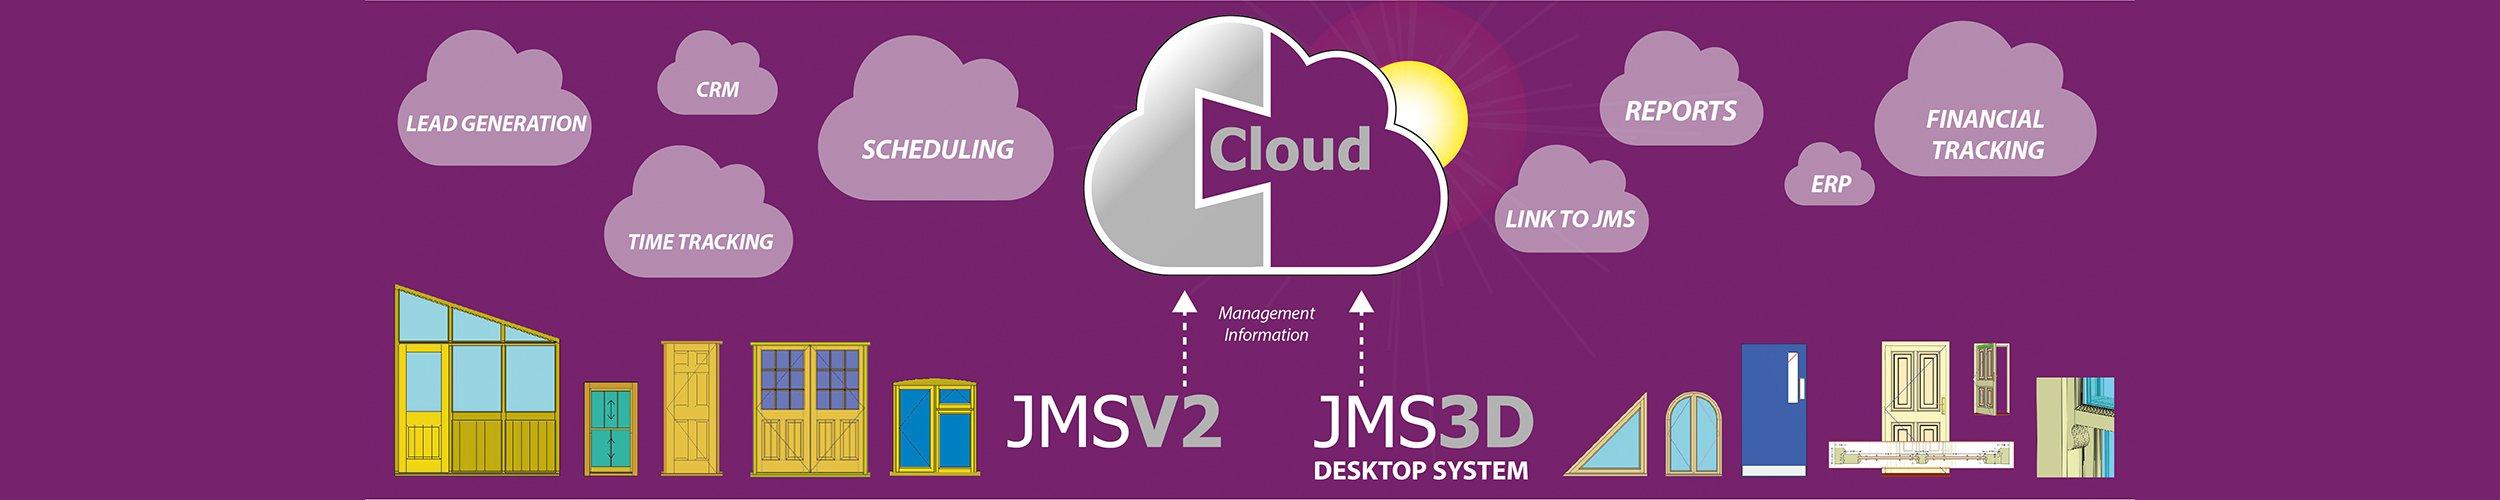 Cloud Page Heading Image